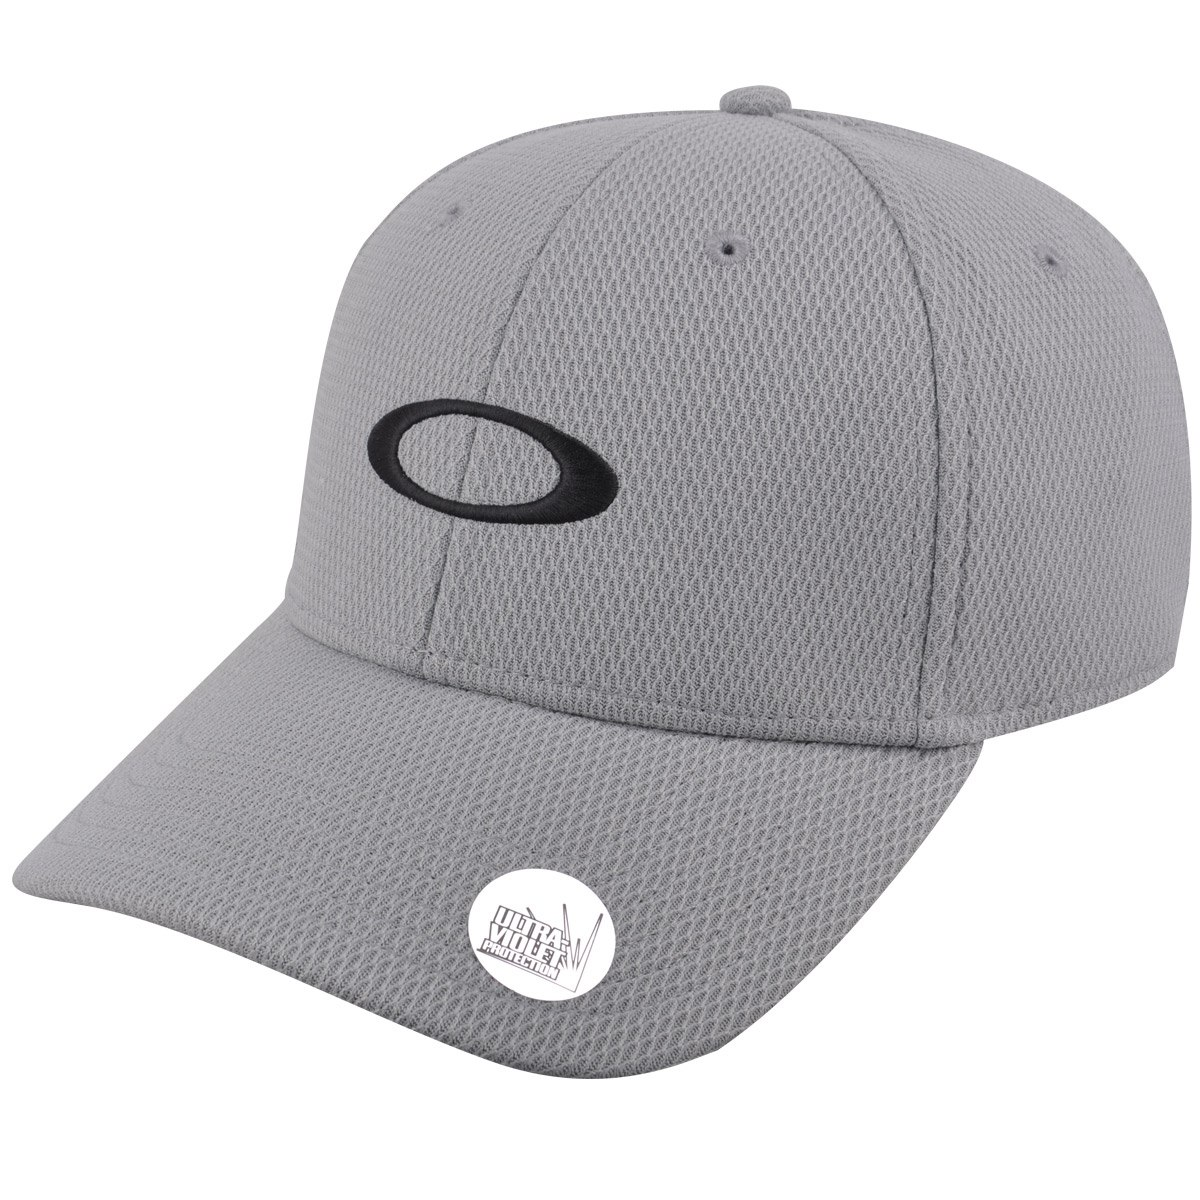 boné oakley golf ellipse - cut wave. Carregando zoom. 49ba2029fe7